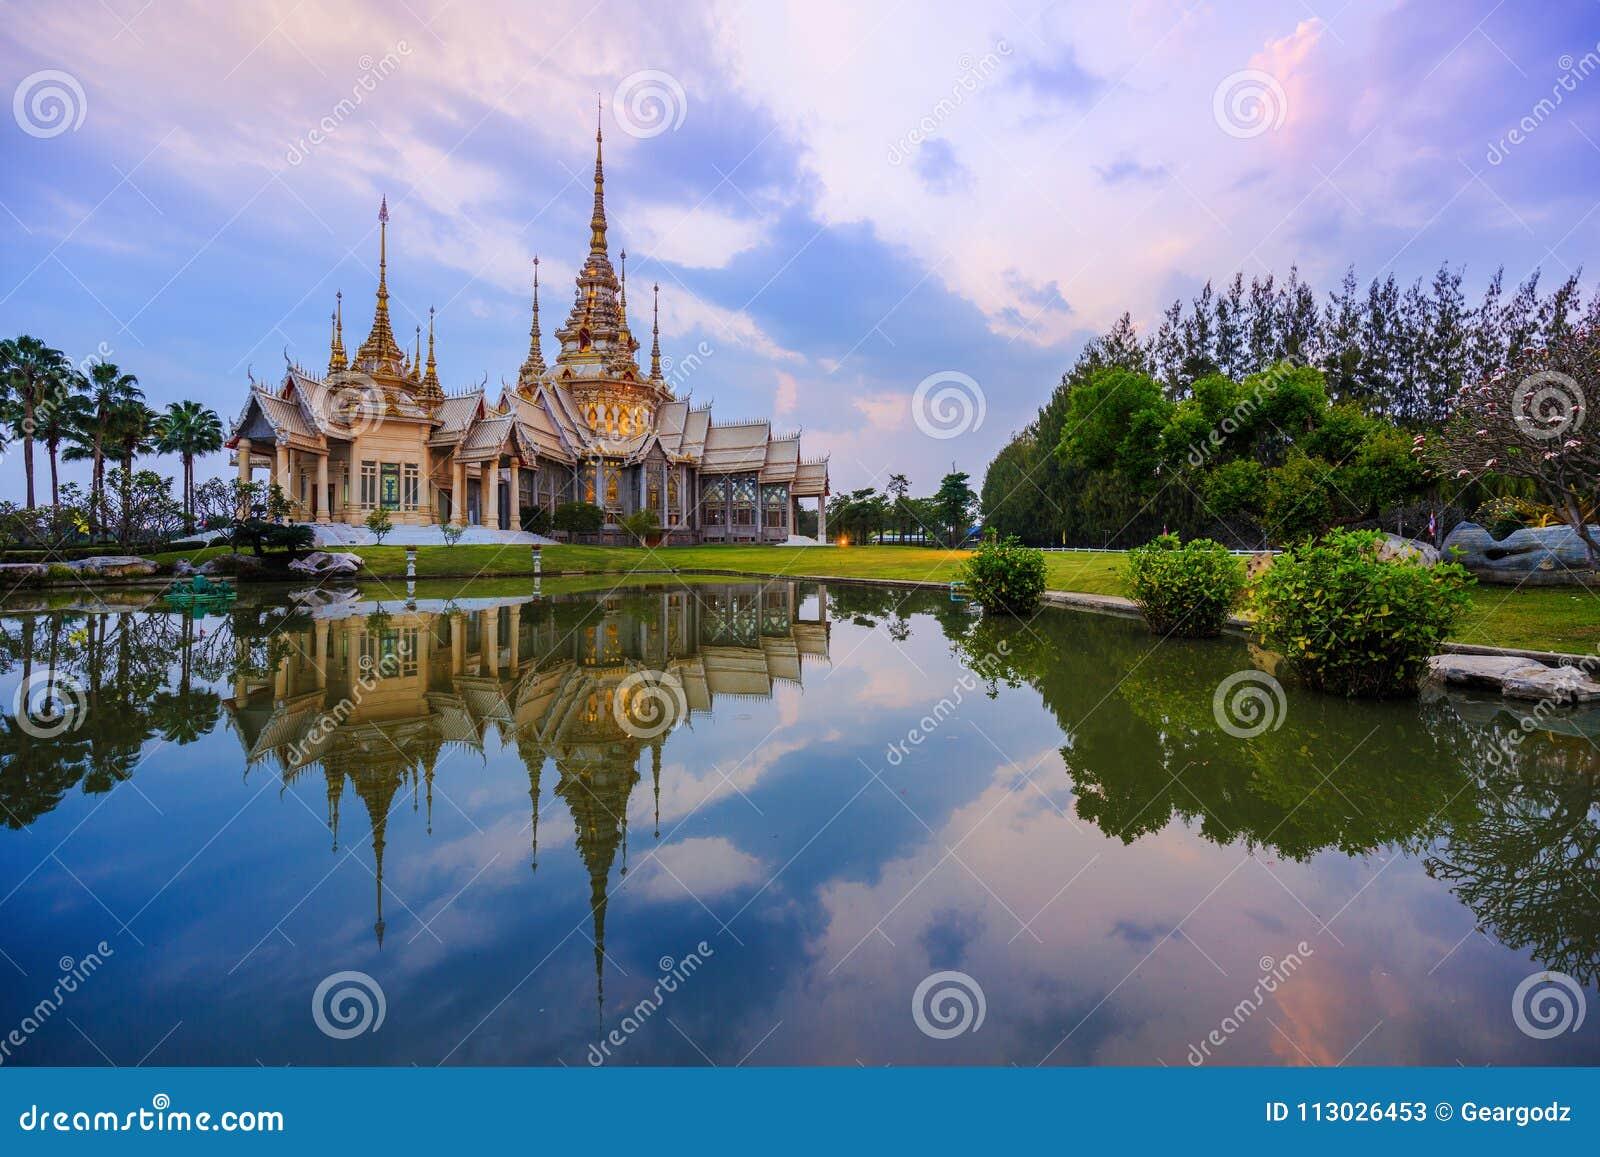 Templo de Wat None Kum en Nakhon Ratchasima, Tailandia